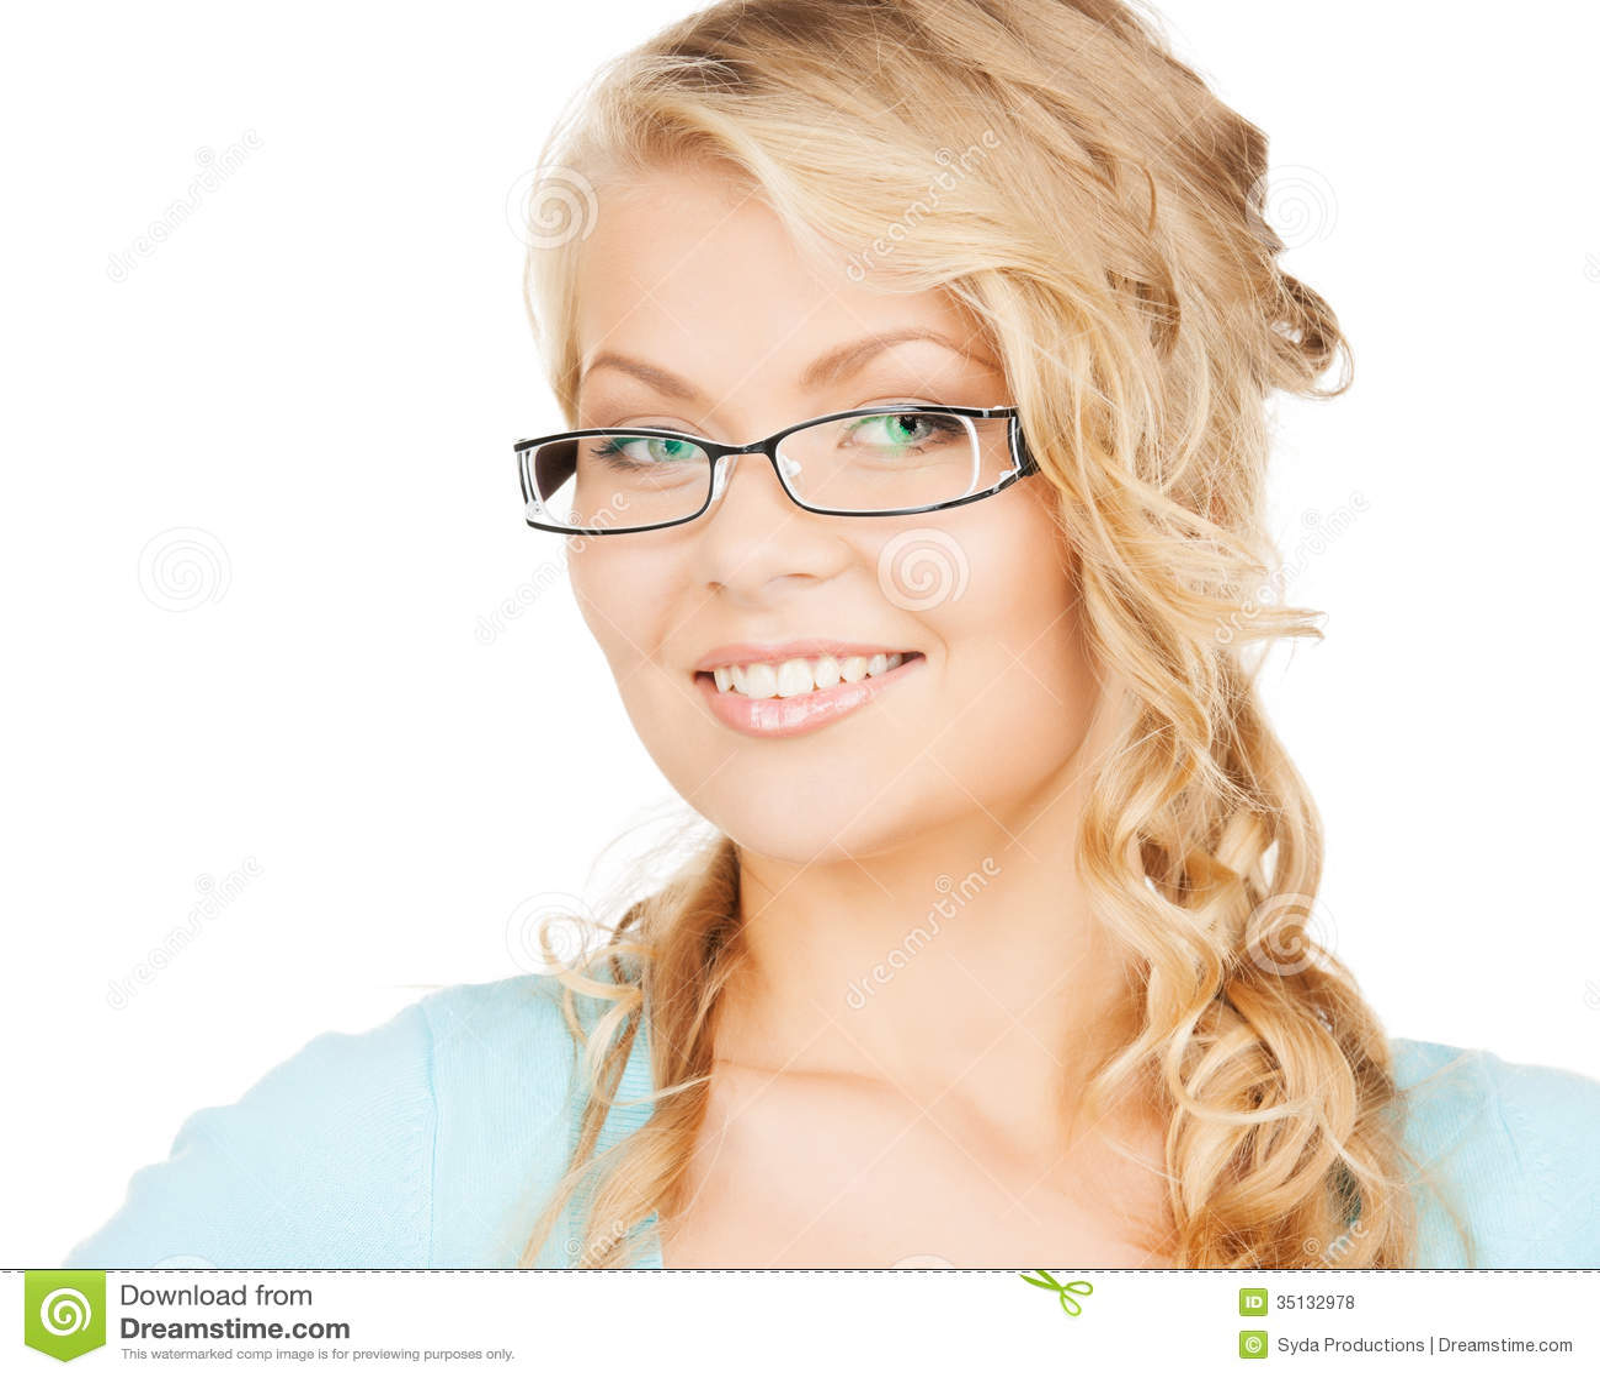 eyeglasses woman